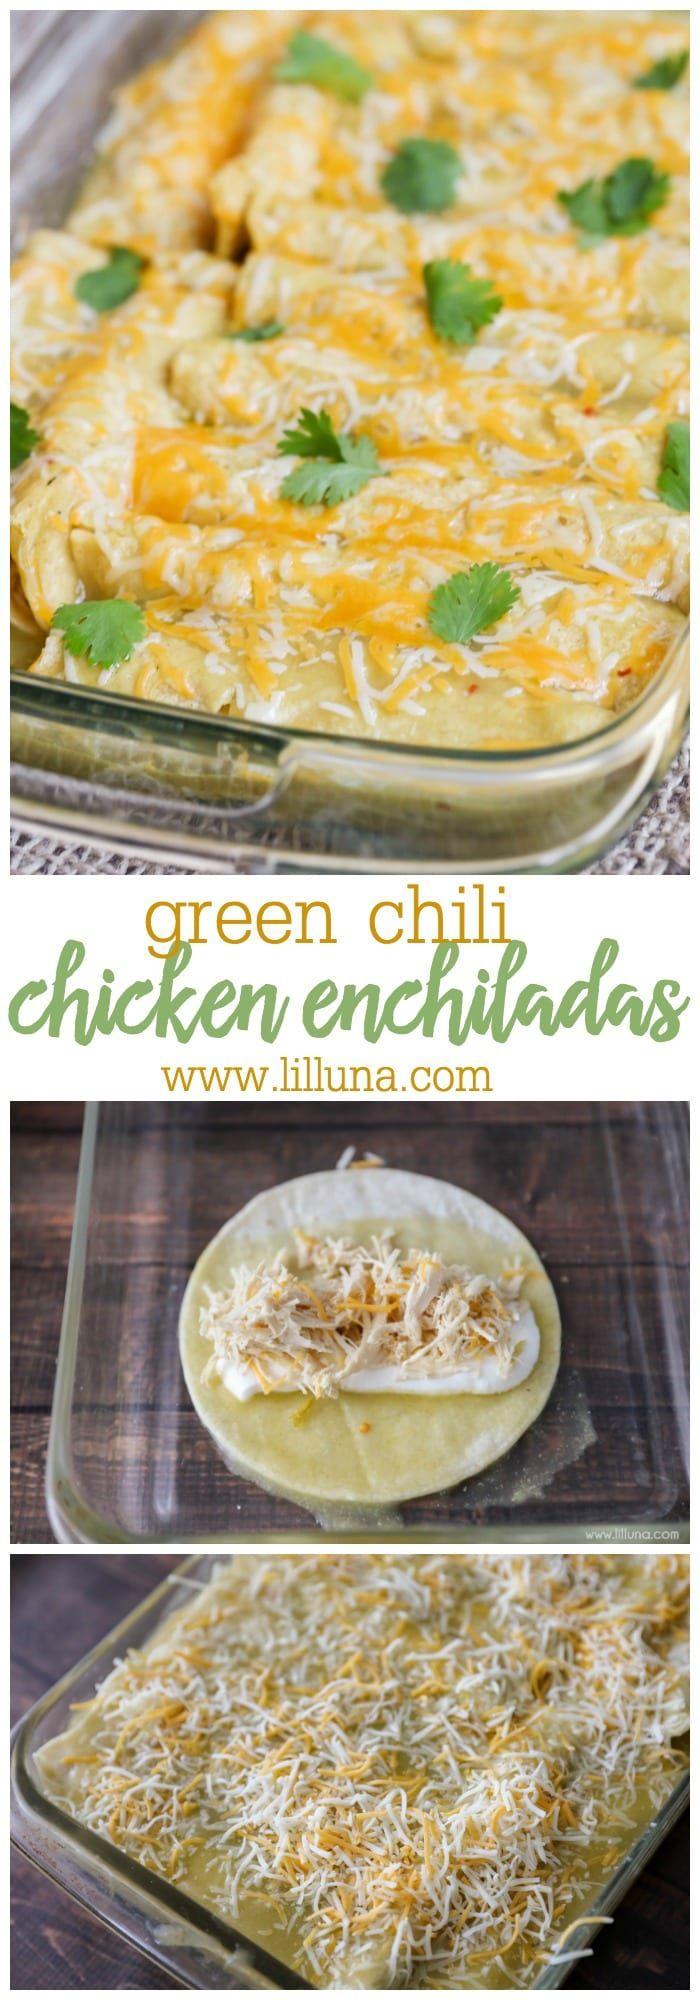 Best Green Chile Chicken Enchiladas Video Lil Luna Recipe Mexican Food Recipes Recipes Enchilada Recipes